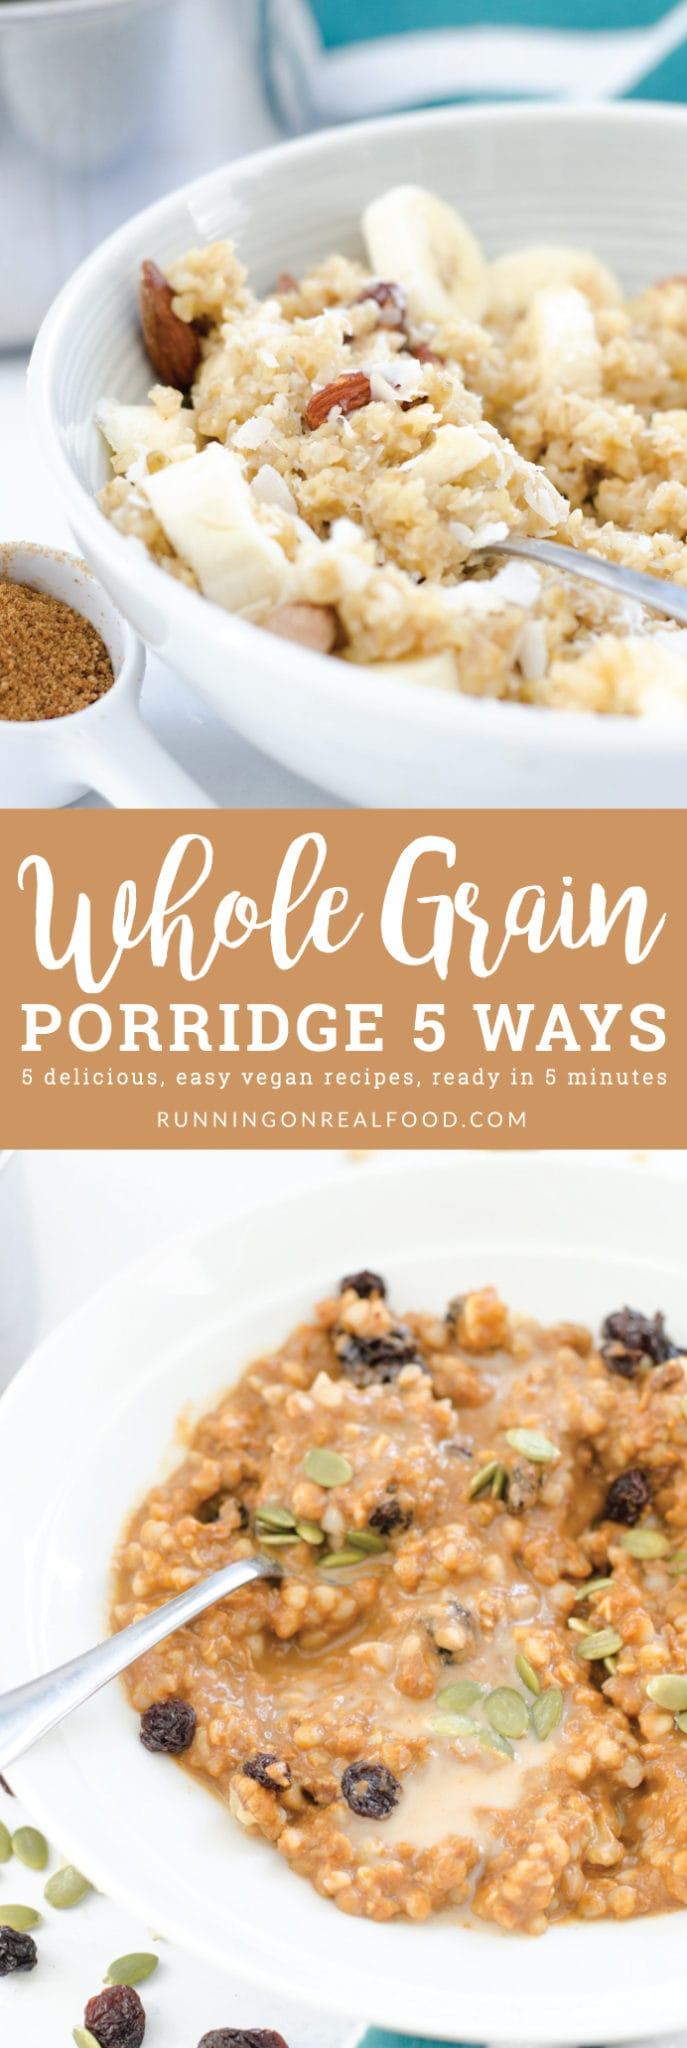 Healthy Whole Grain Porridge